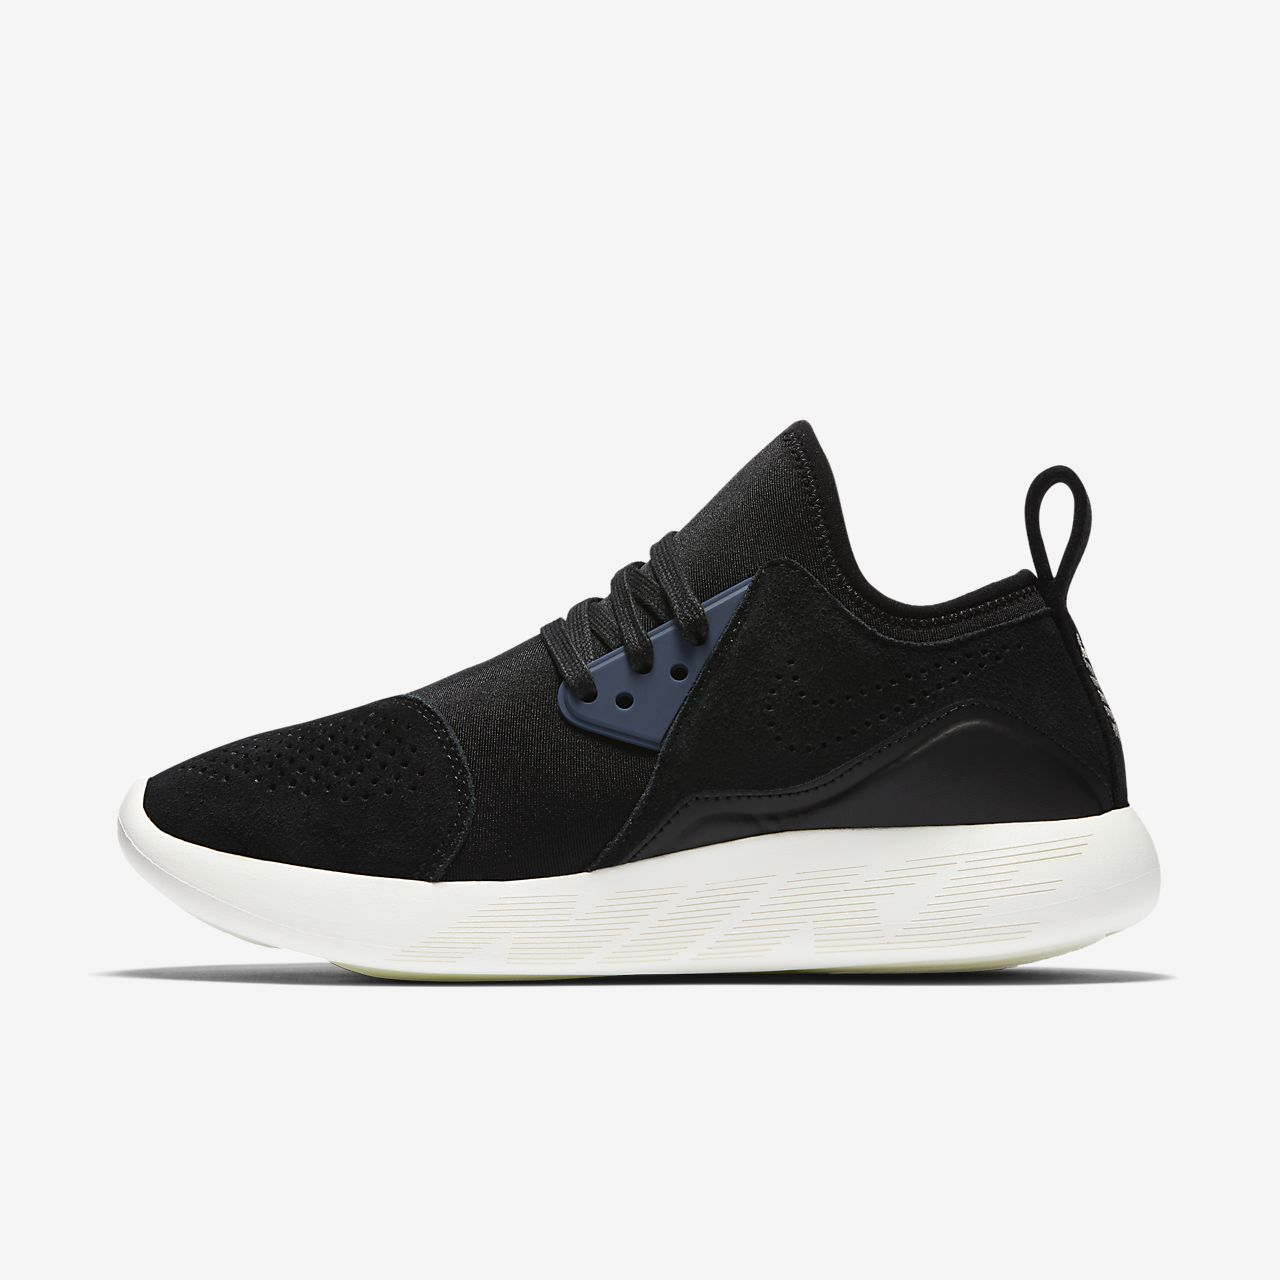 ... Scarpa Nike LunarCharge Premium - Donna